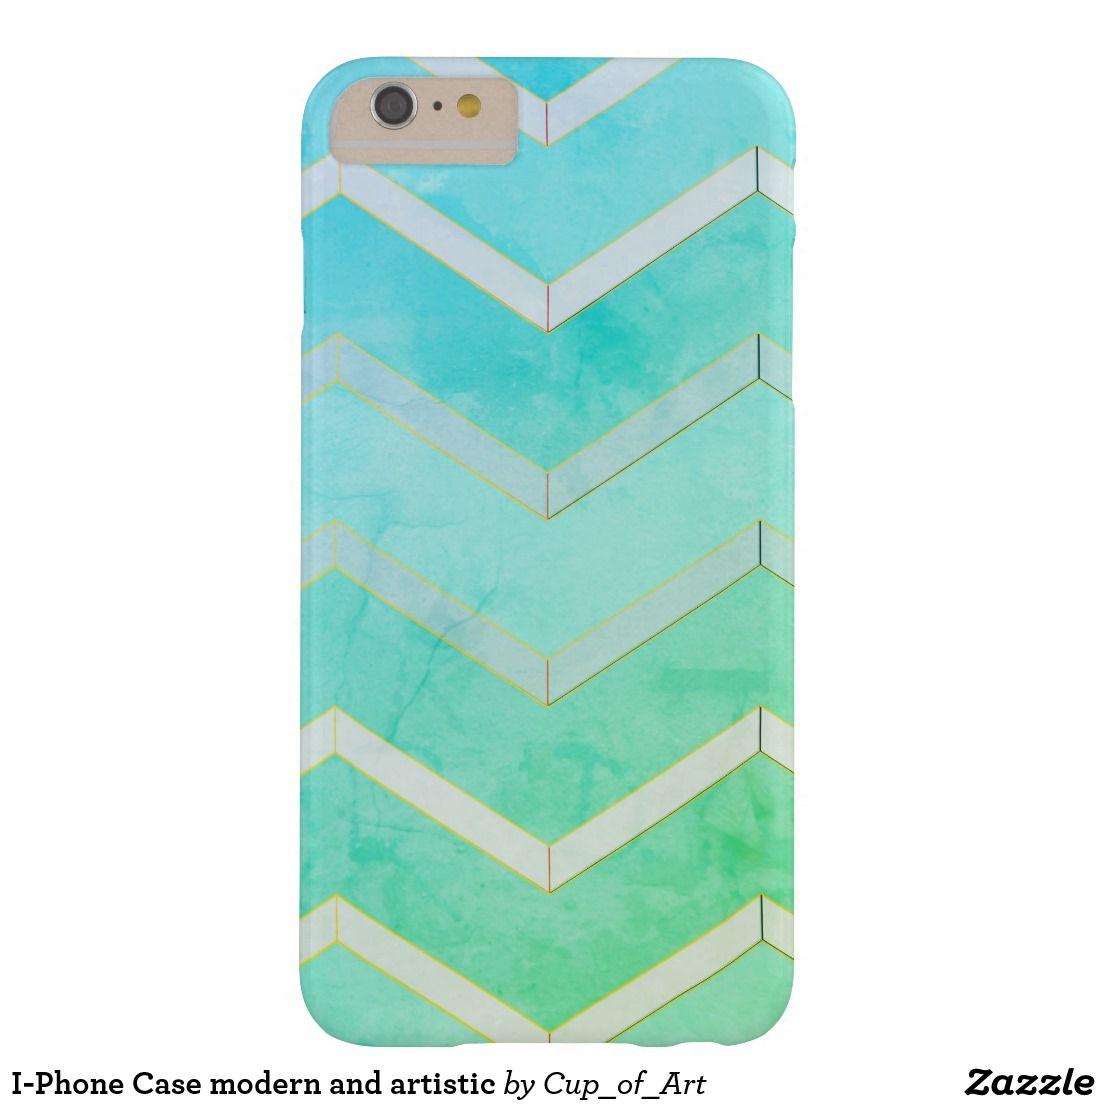 new concept 253d9 5a1e3 I-Phone Case modern and artistic | Zazzle.com | my work | Phone ...